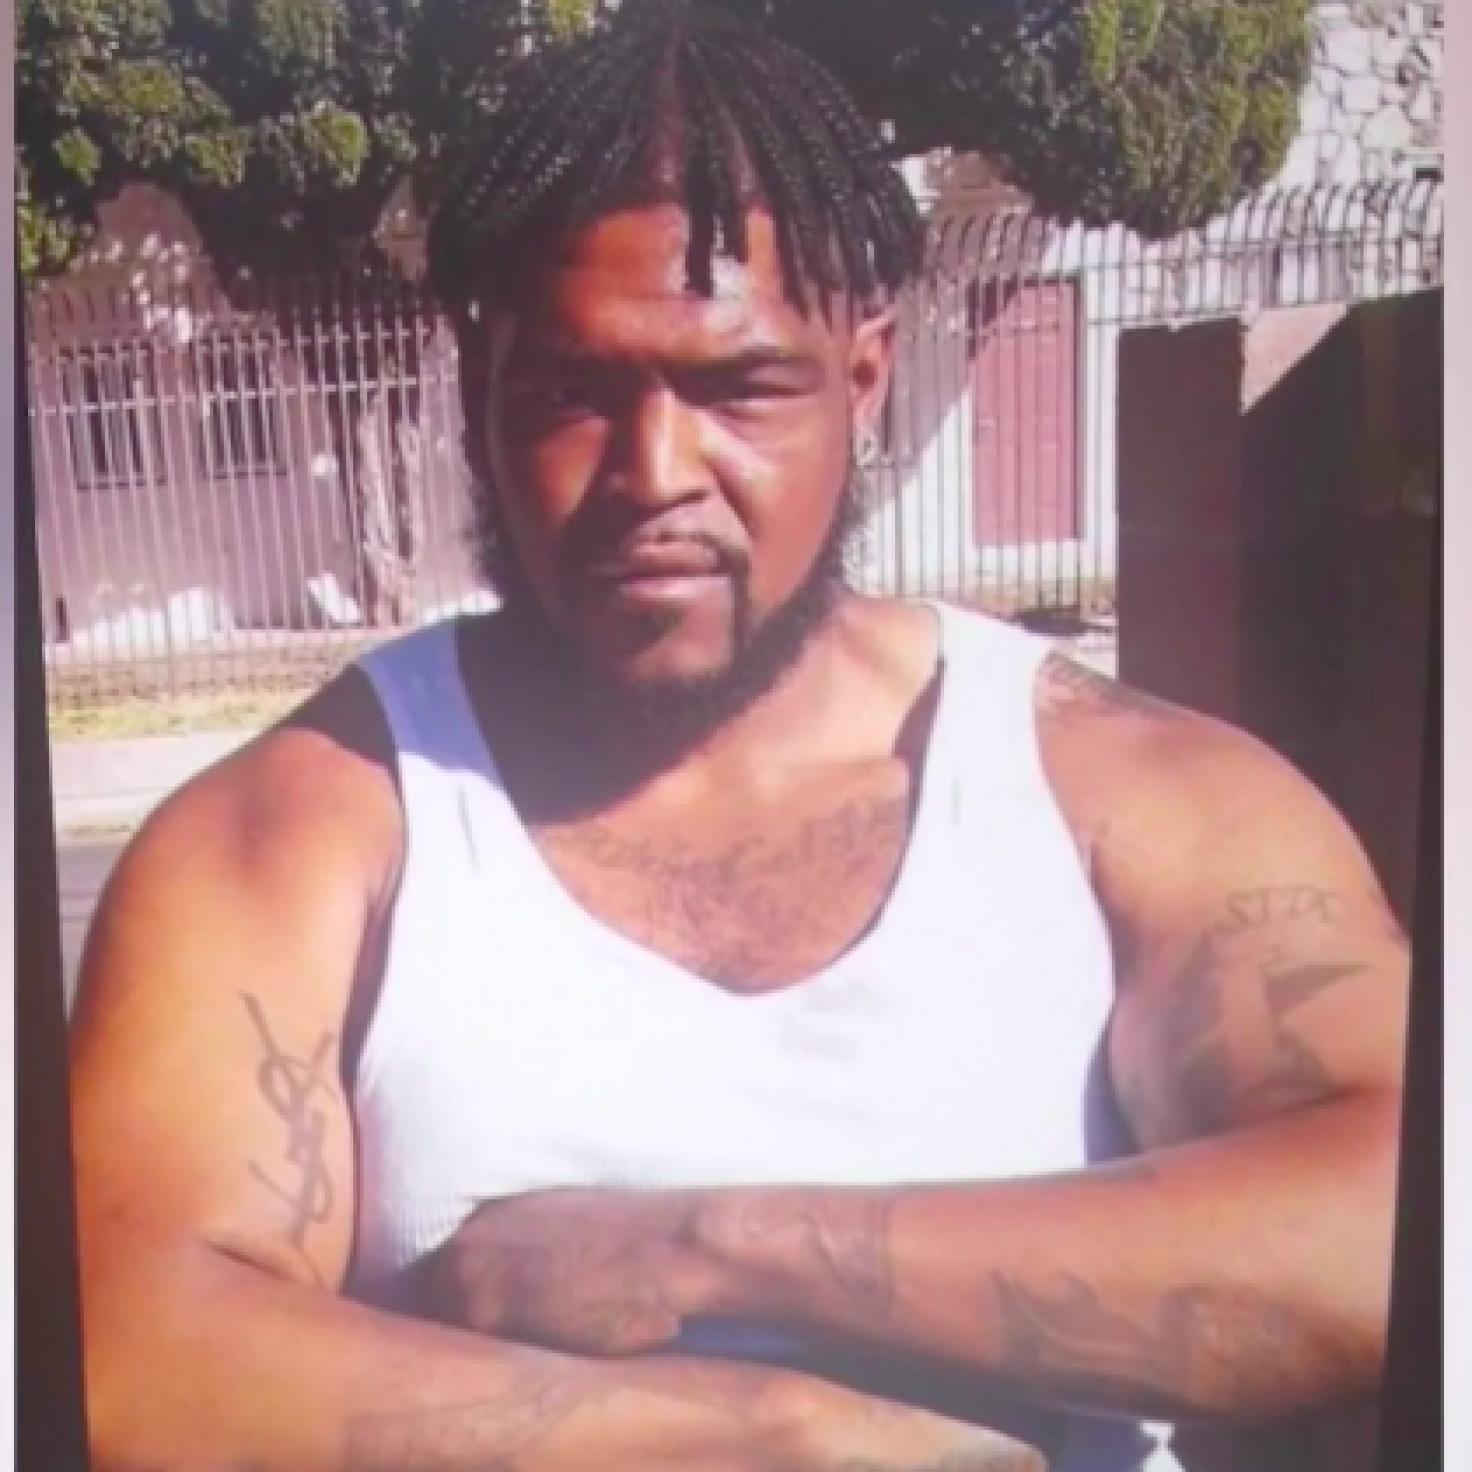 L.A. Deputies Fatally Shoot Black Man Who Dropped Bundle With Handgun